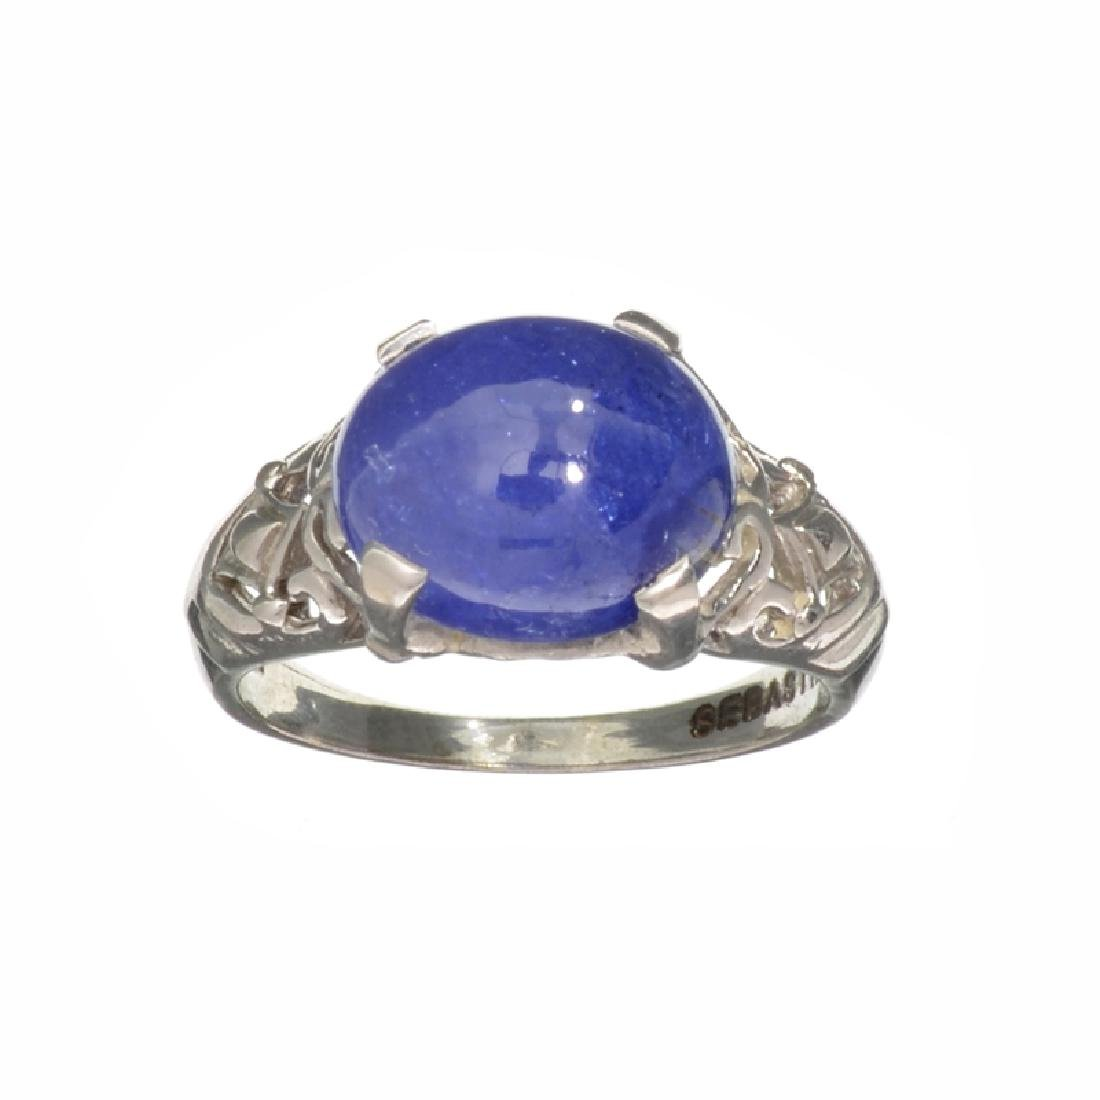 Fine Jewelry Designer Sebastian 5.38CT Oval Cut